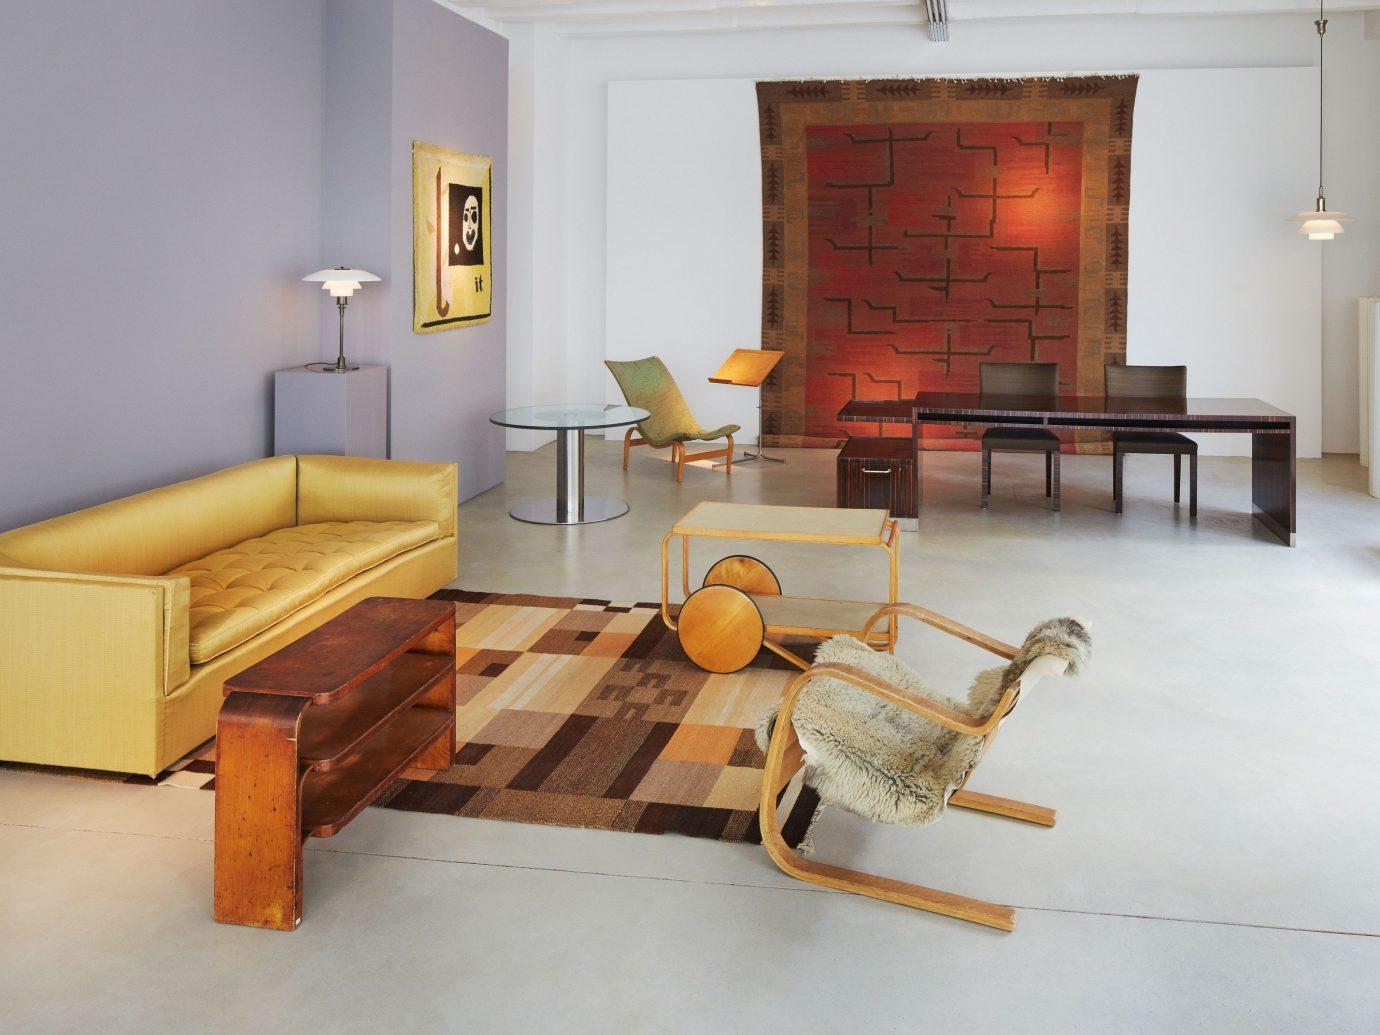 Style + Design wall floor indoor Living room property living room furniture hardwood interior design home cottage wood hearth real estate Design Suite apartment Bedroom